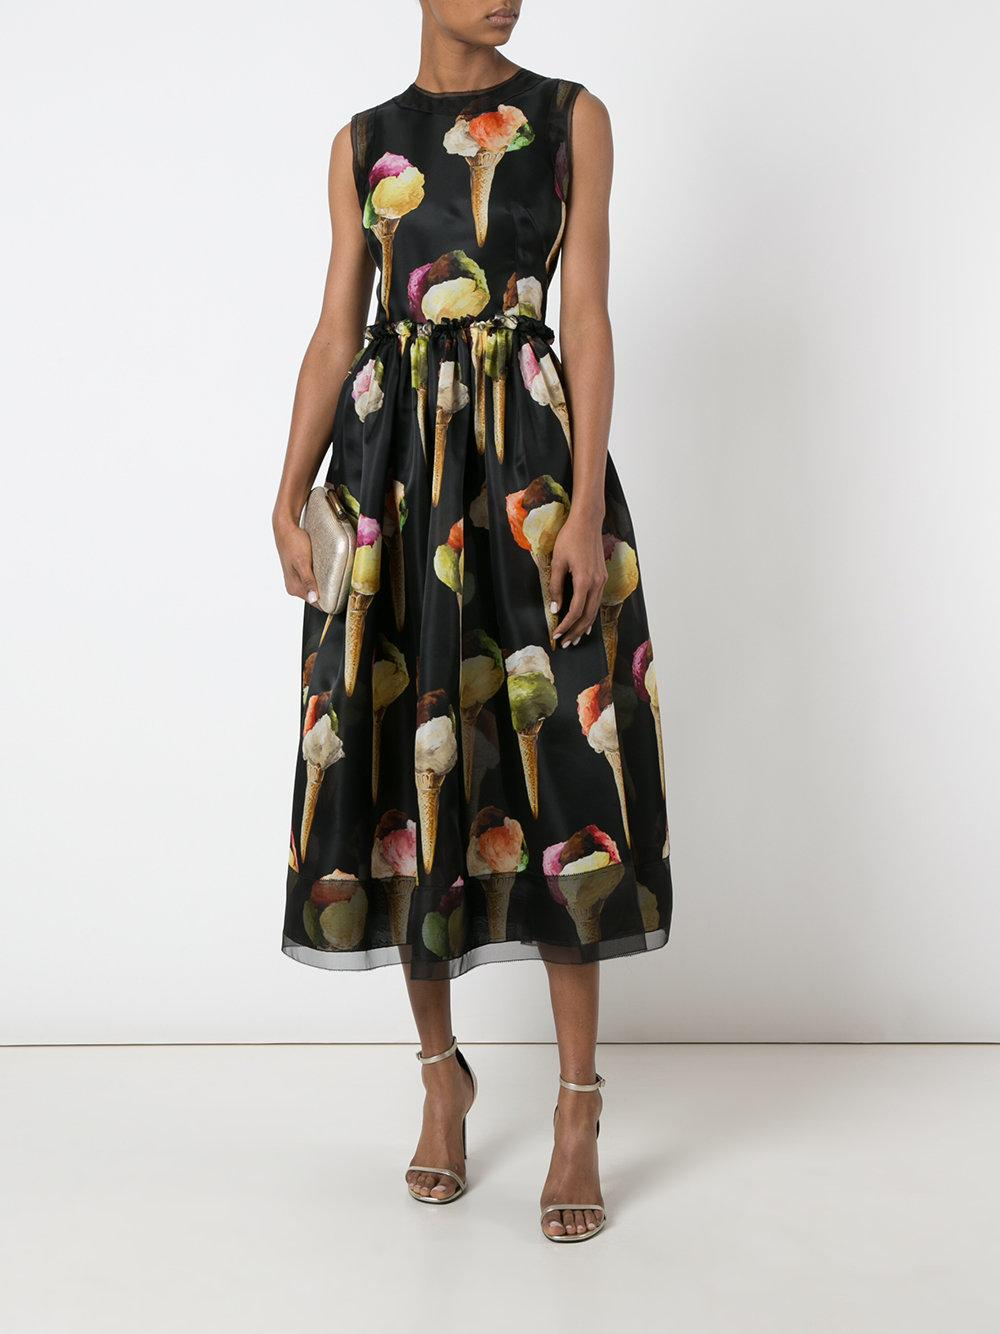 Lyst Dolce Amp Gabbana Ice Cream Print Dress In Black